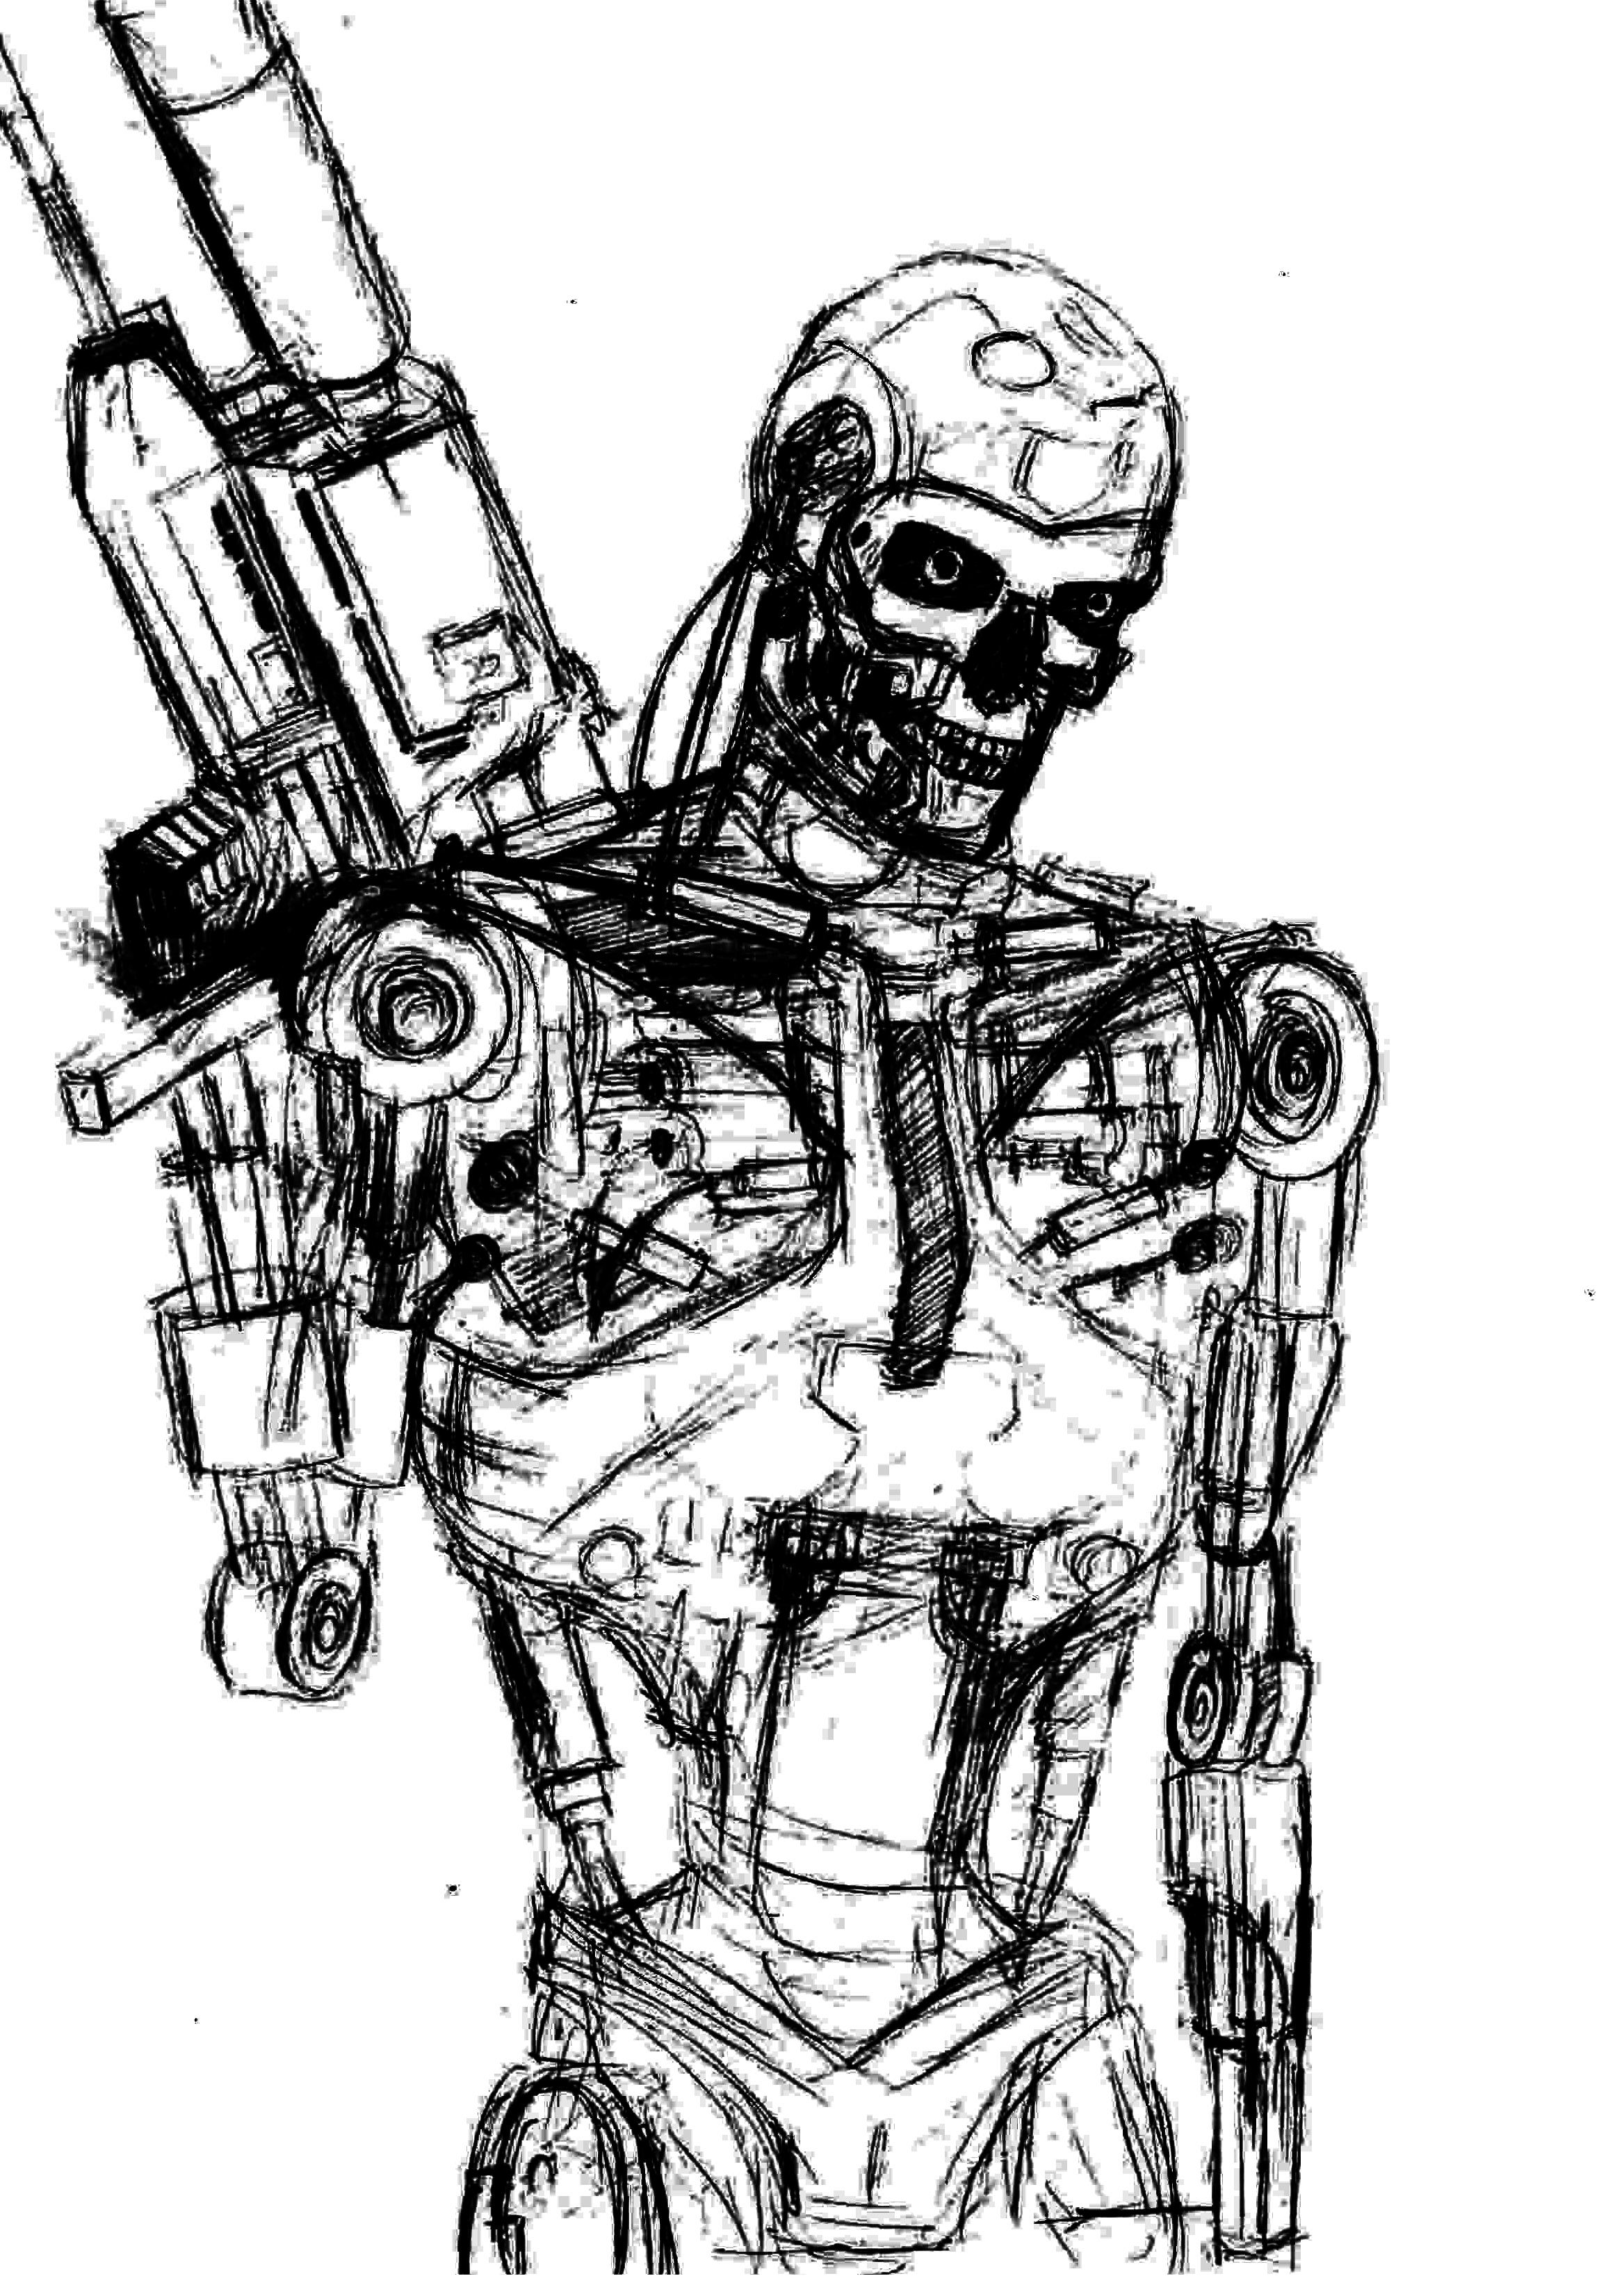 http://fc09.deviantart.net/fs45/f/2009/138/3/5/Terminator_Salvation_by_rahulnsm.jpg